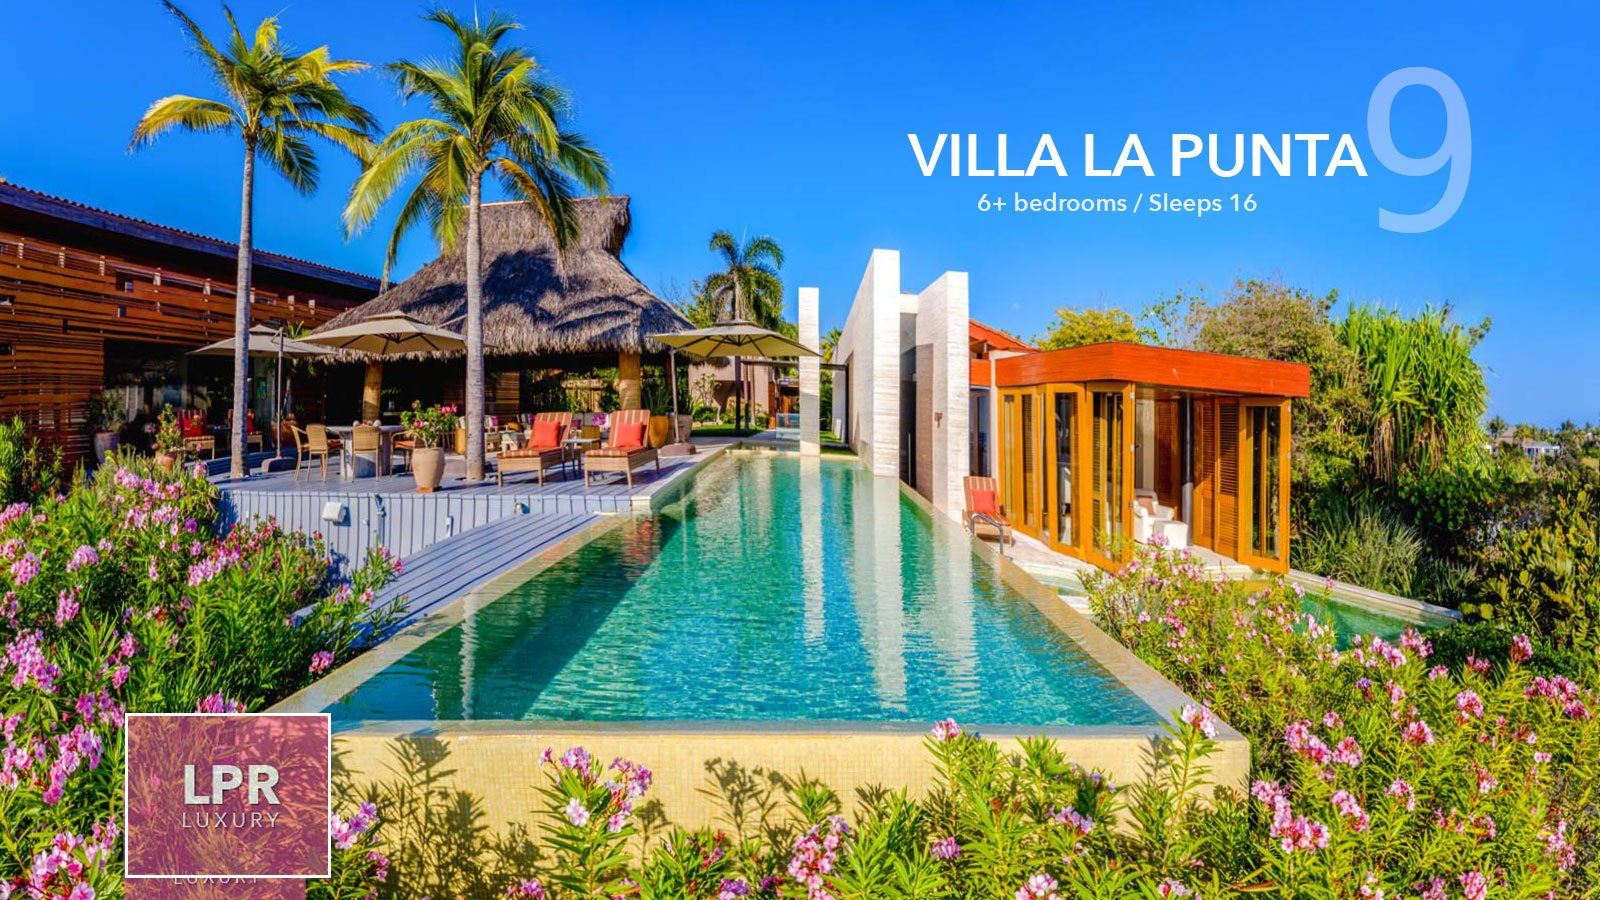 Villa La Punta 9 - Luxury beachfront vacation rental villa at the Punta Mita Resort, Riviera Nayarit, Mexico